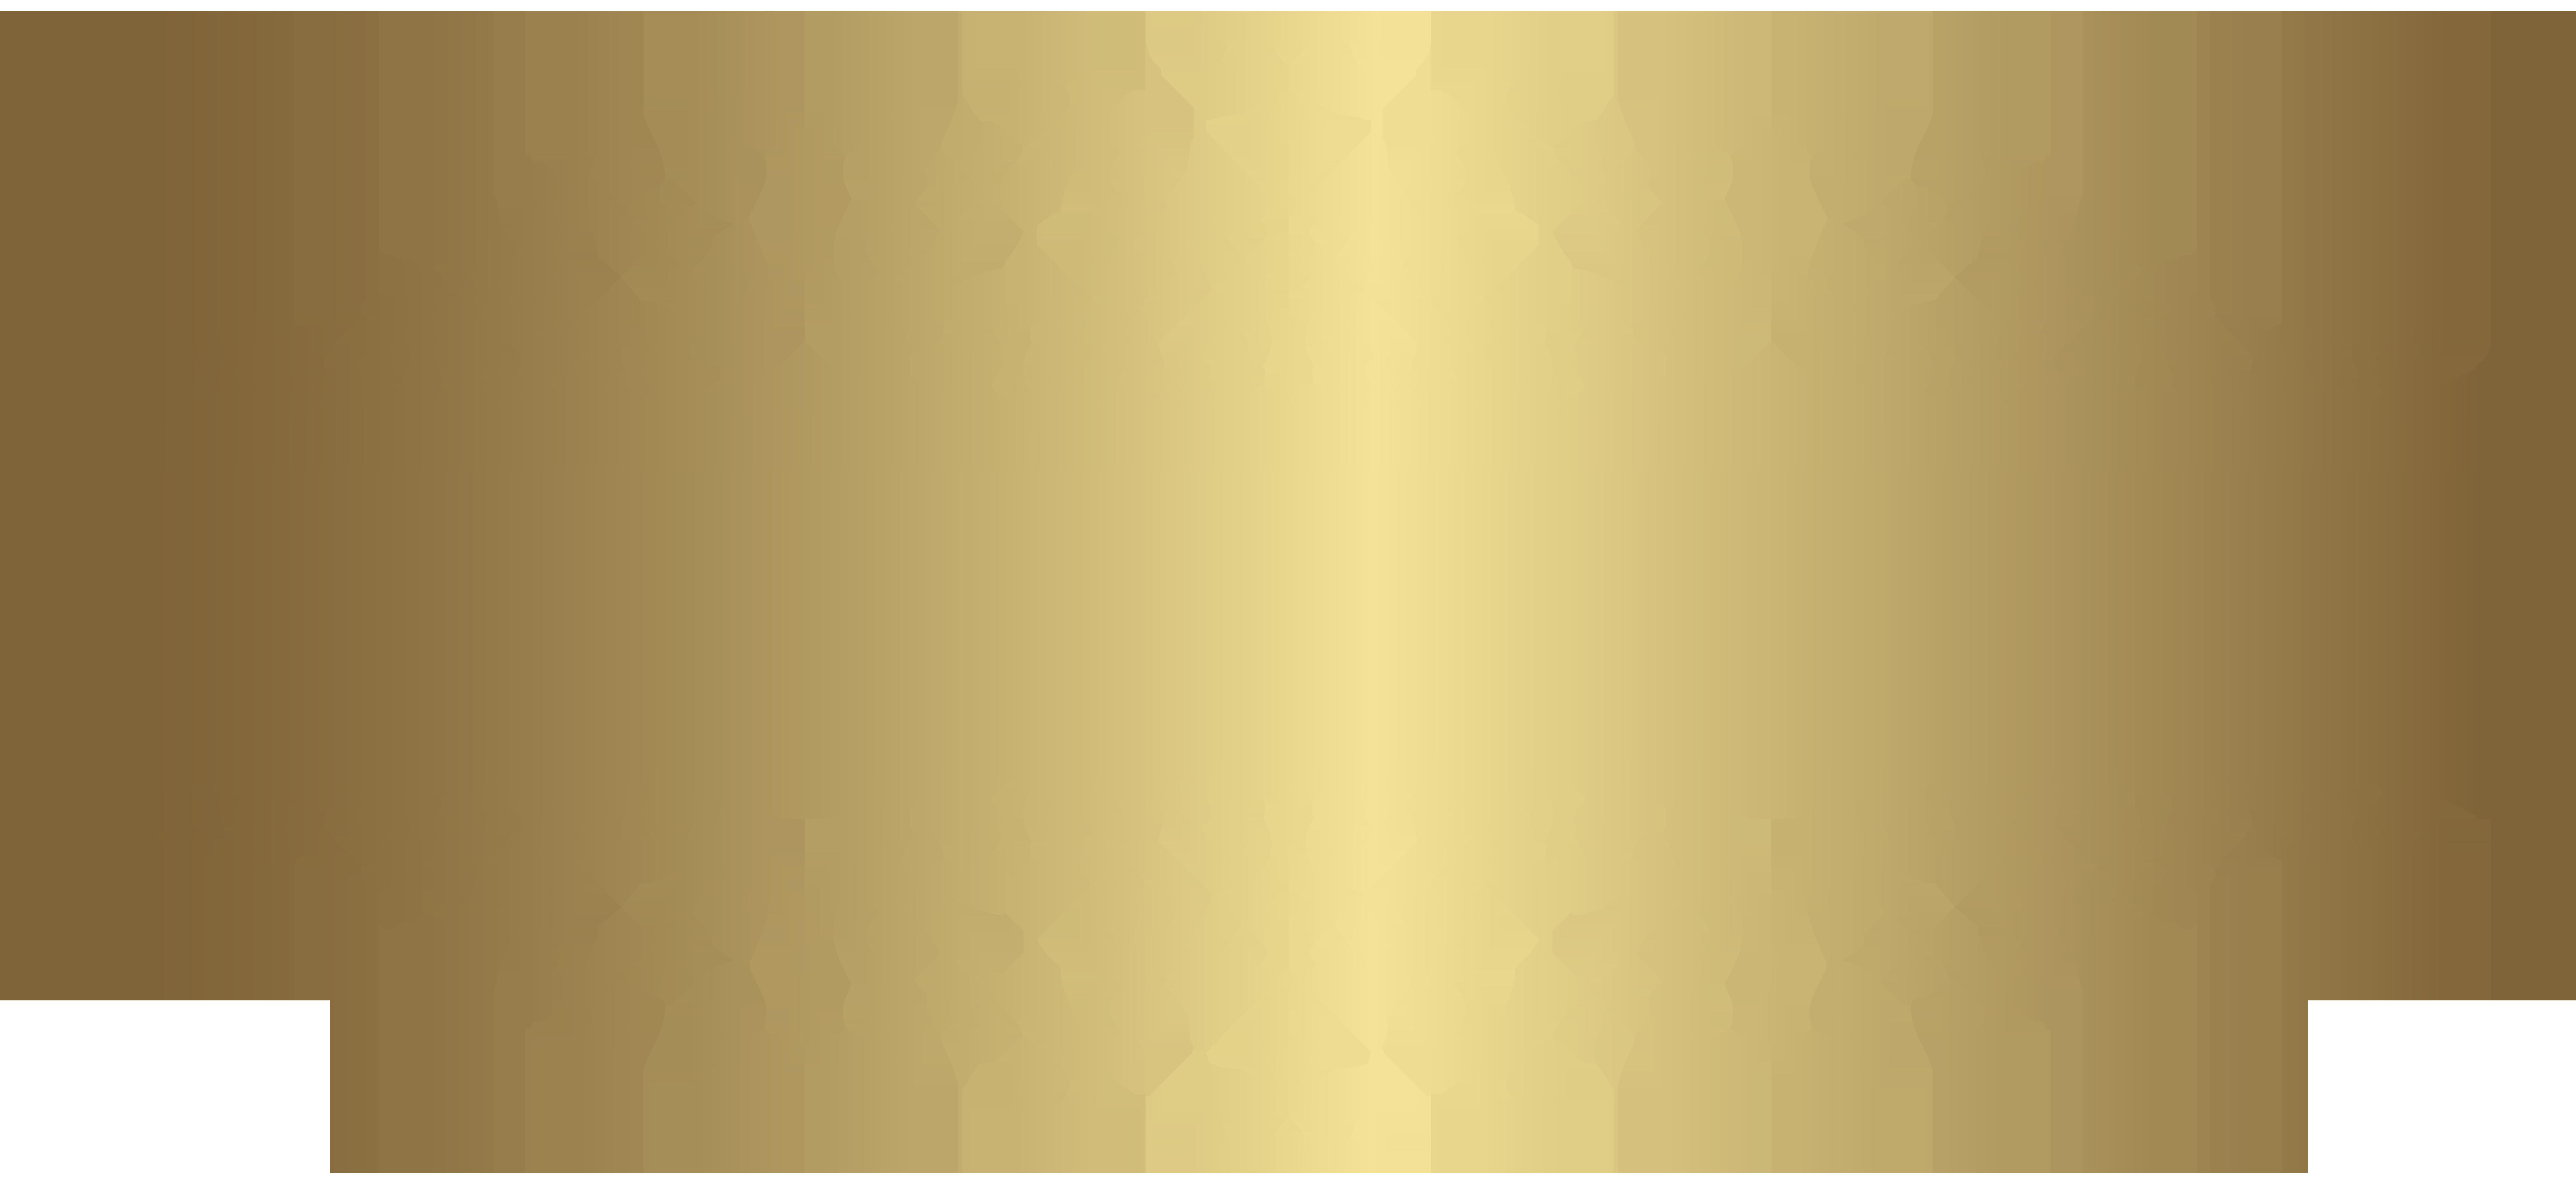 Gold Decorative Element PNG Clip Art.